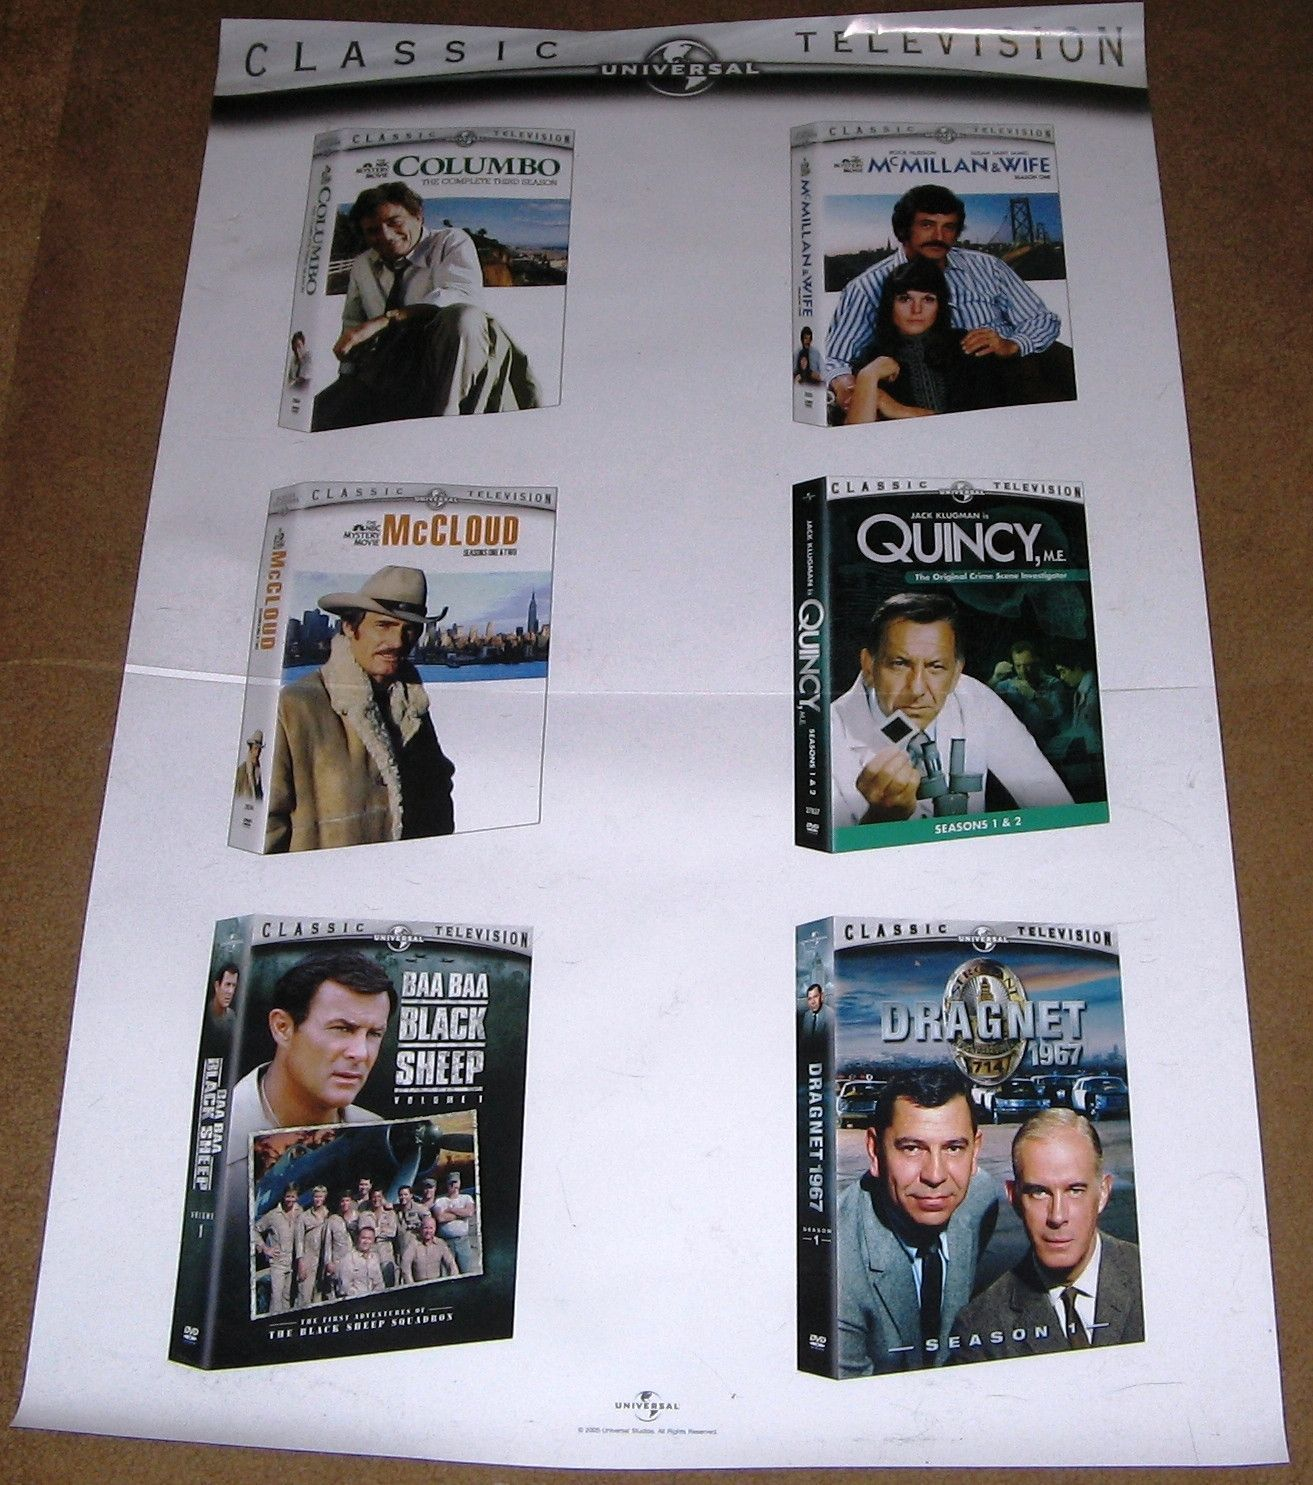 Universal Classic TV Series Movie DVD Poster 27x40 Used Quincy, Dragnet, Columbo, McMillan and Wife, McCloud, Baa Baa Black Sheep